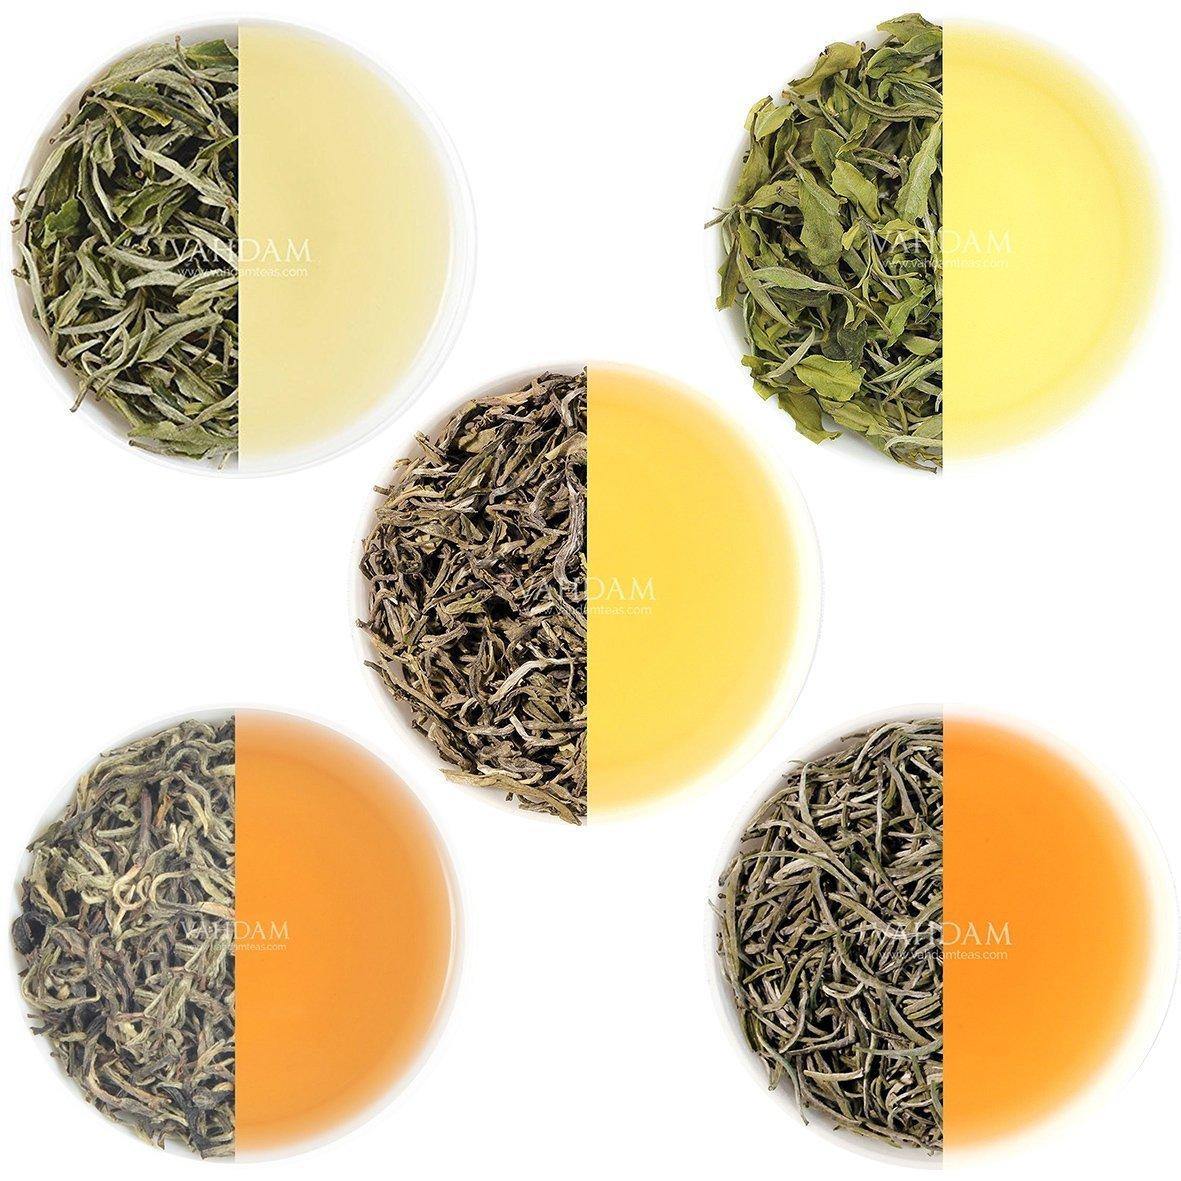 VAHDAM White Quality inspection Tea Loose Leaf Animer and price revision Sampler TEAS T 5 Himalaya -